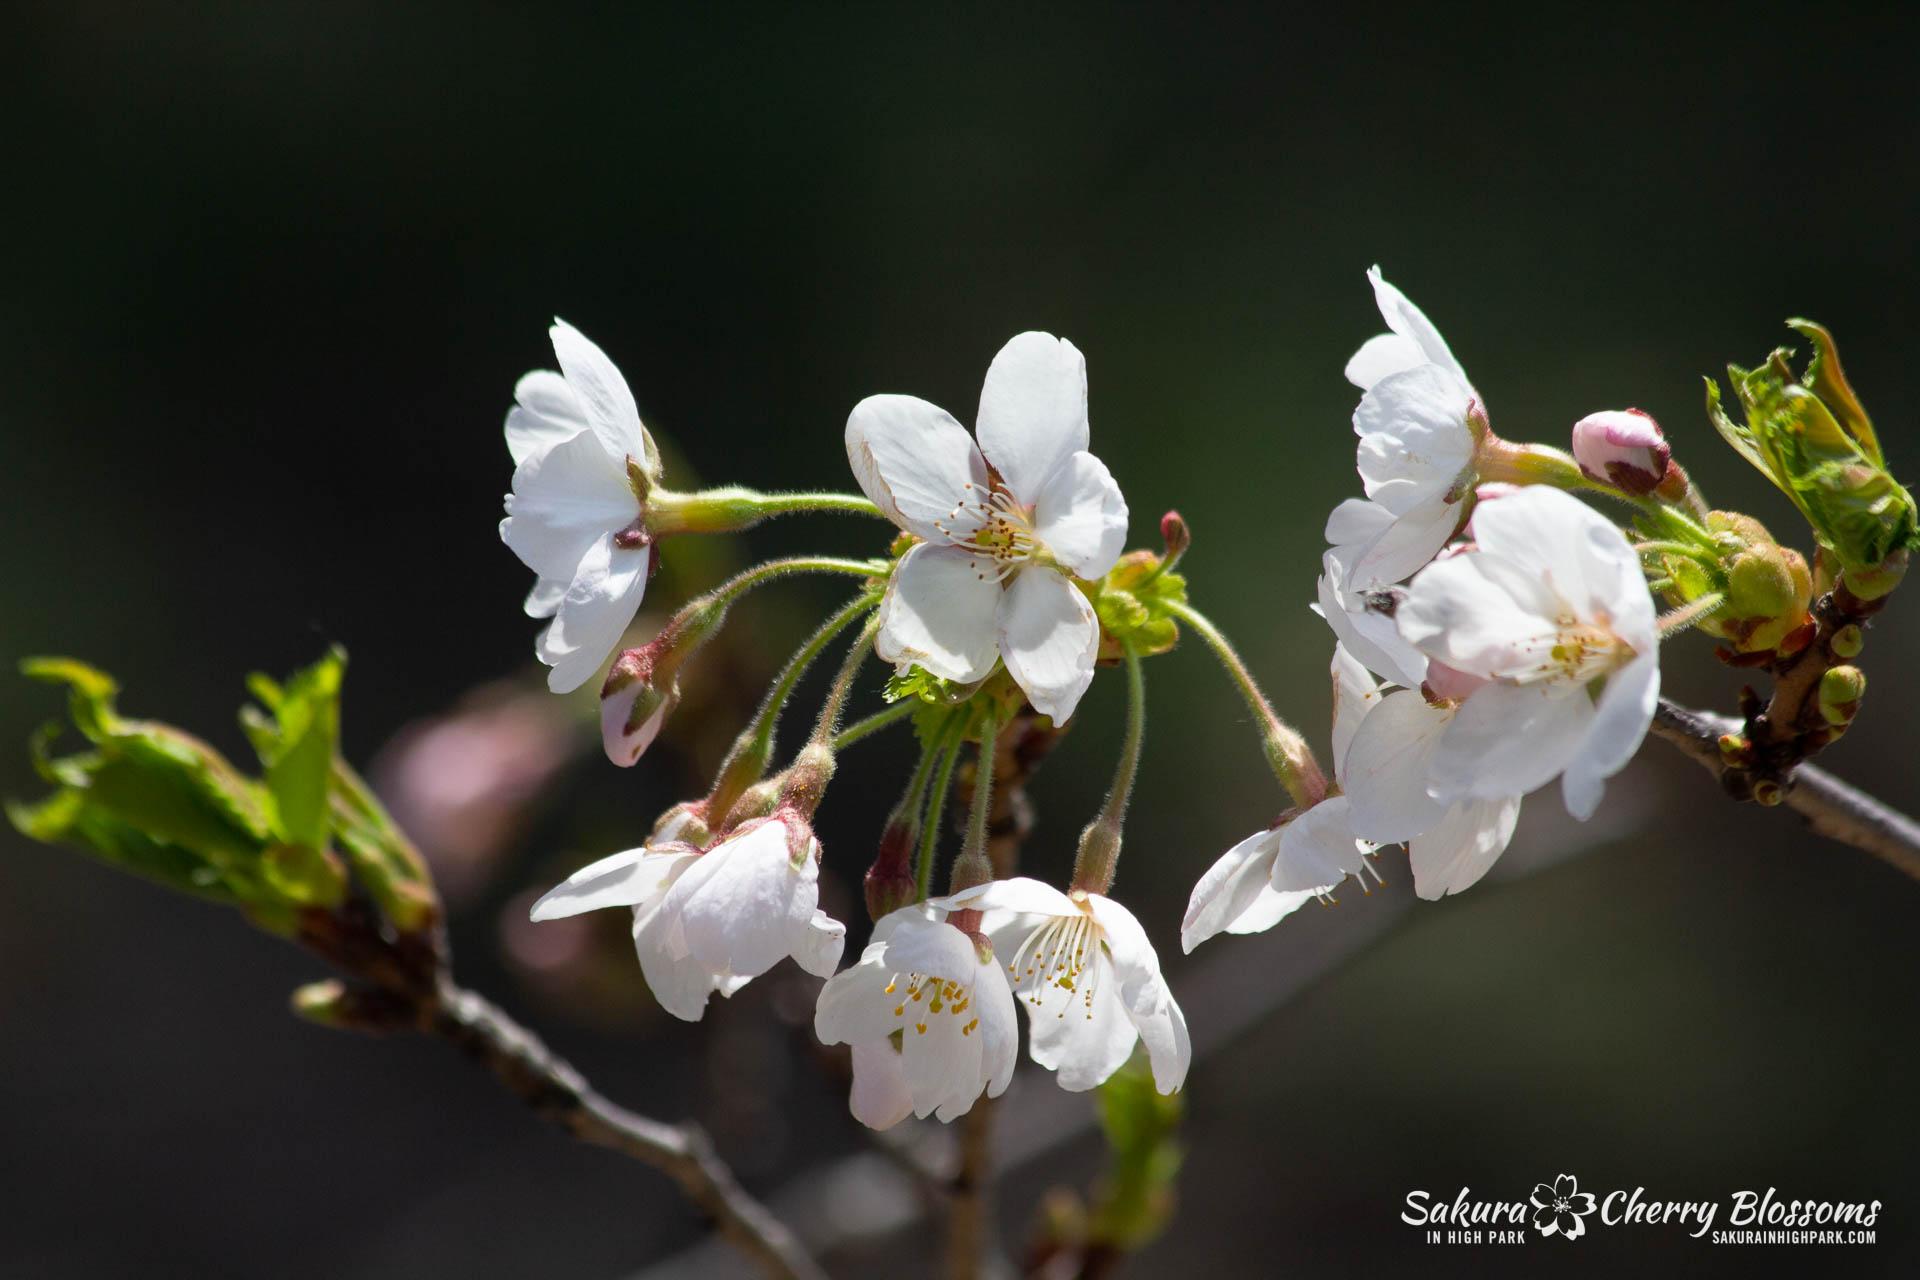 Sakura-Watch-May-5-2018-128.jpg